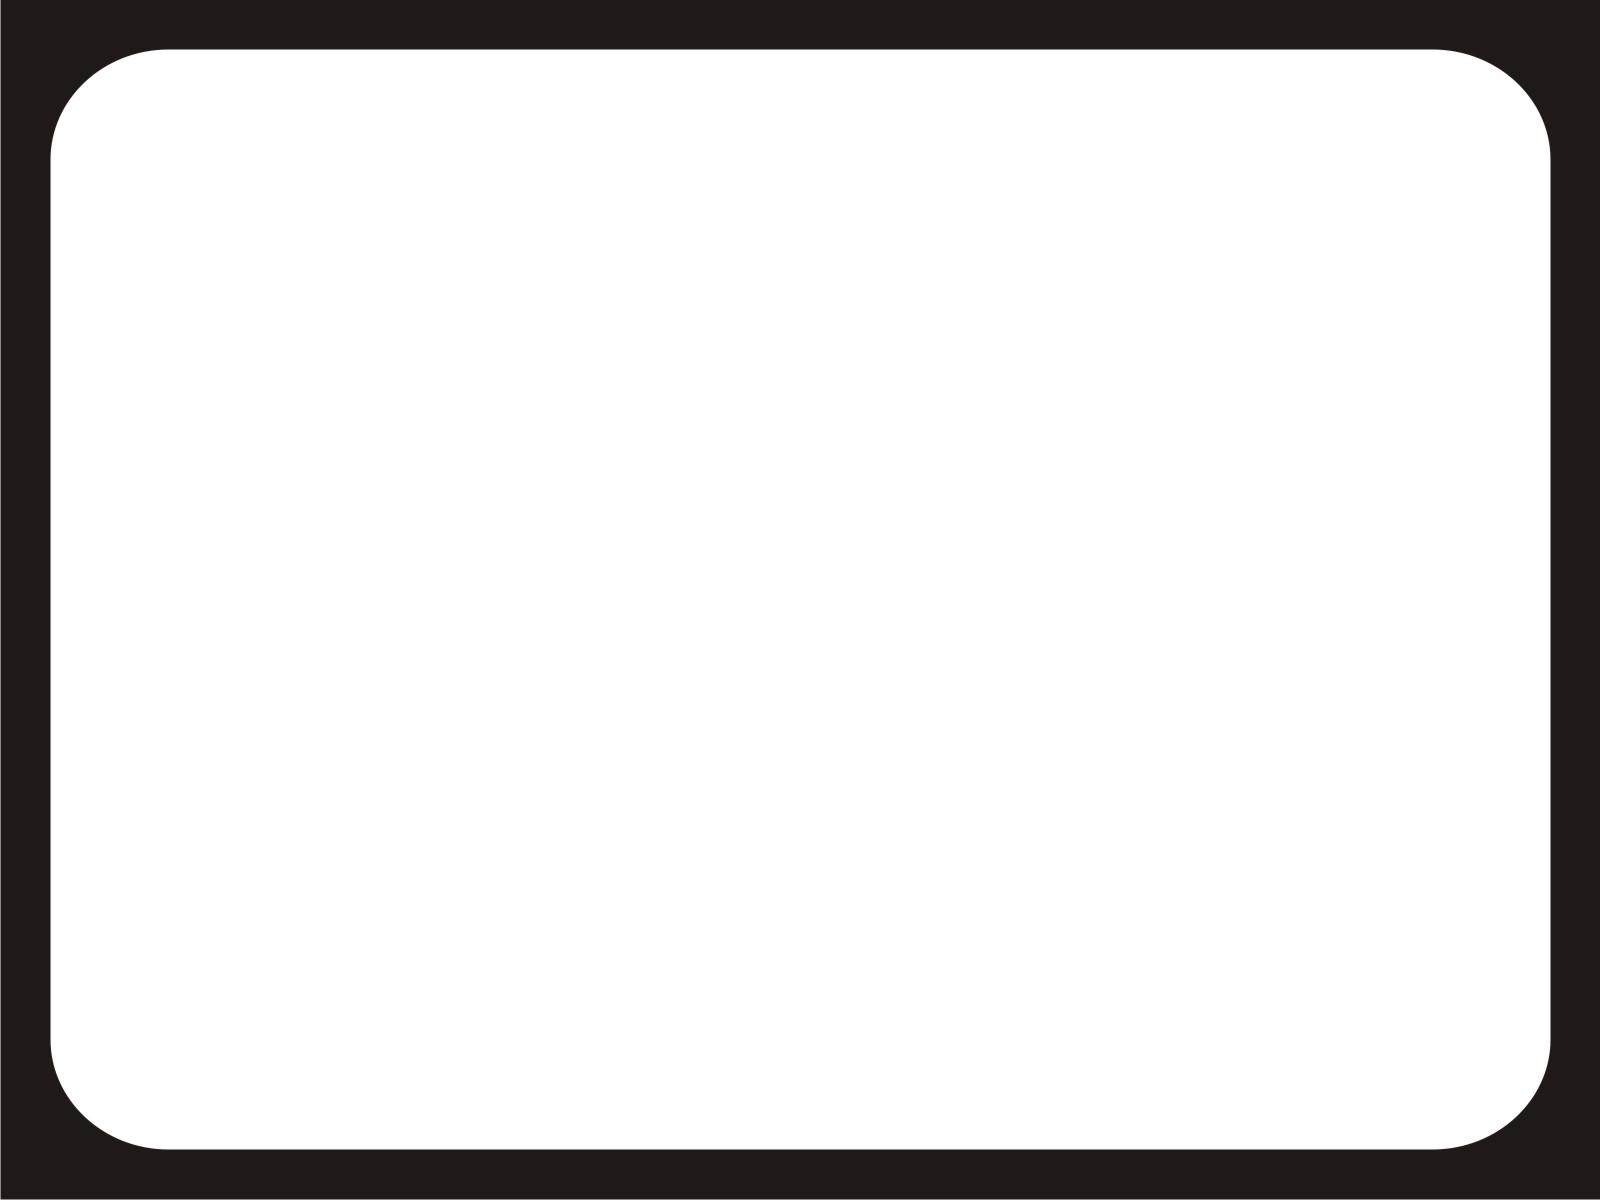 1600x1200 Funeral Clipart Single Line Border